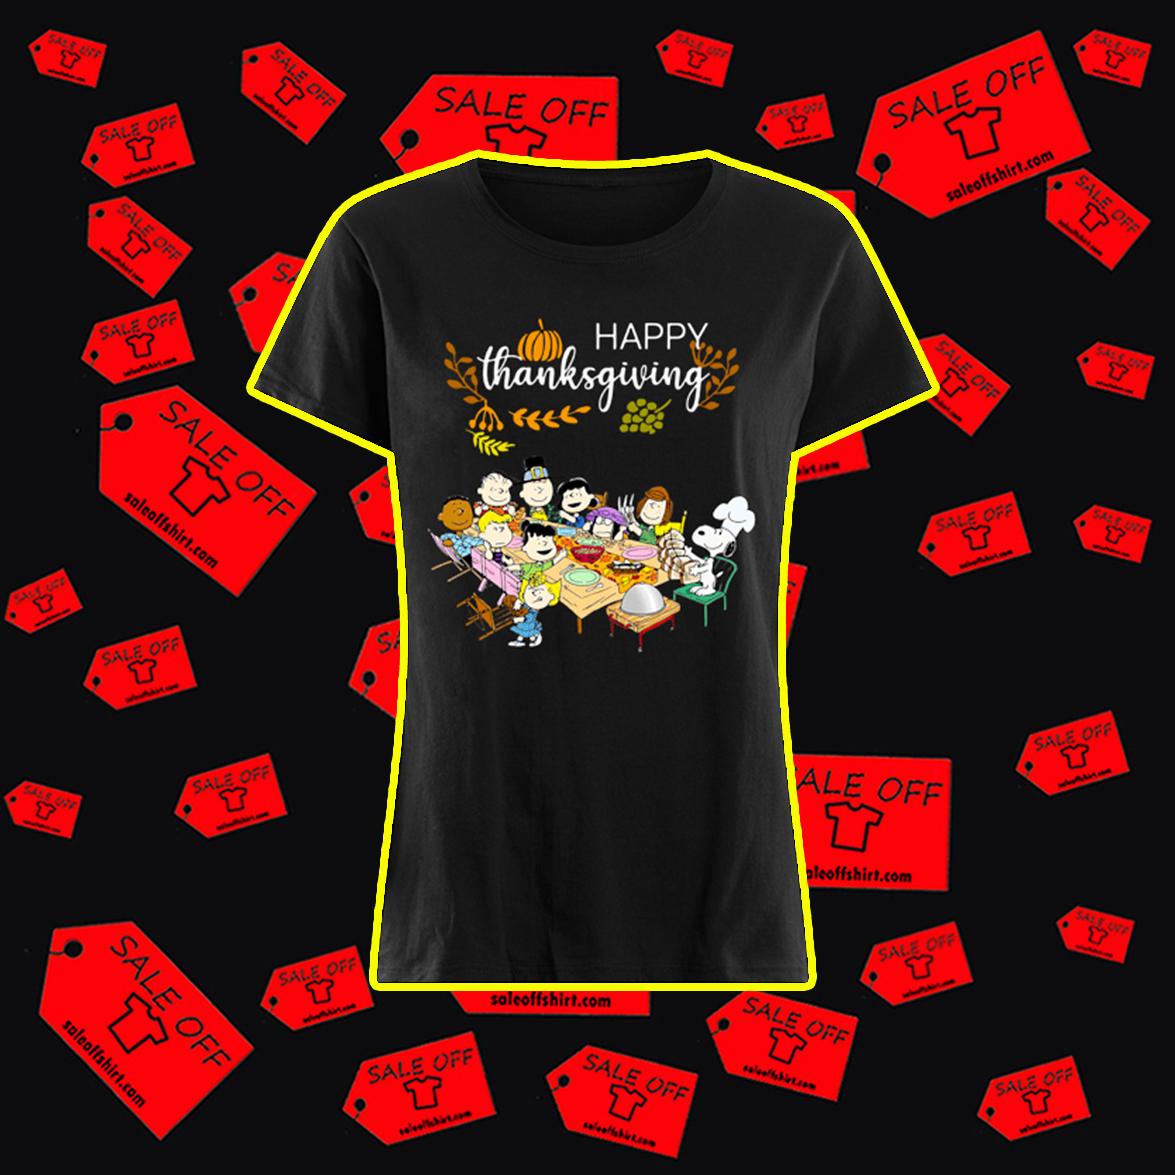 Happy Thanksgiving Peanuts shirt